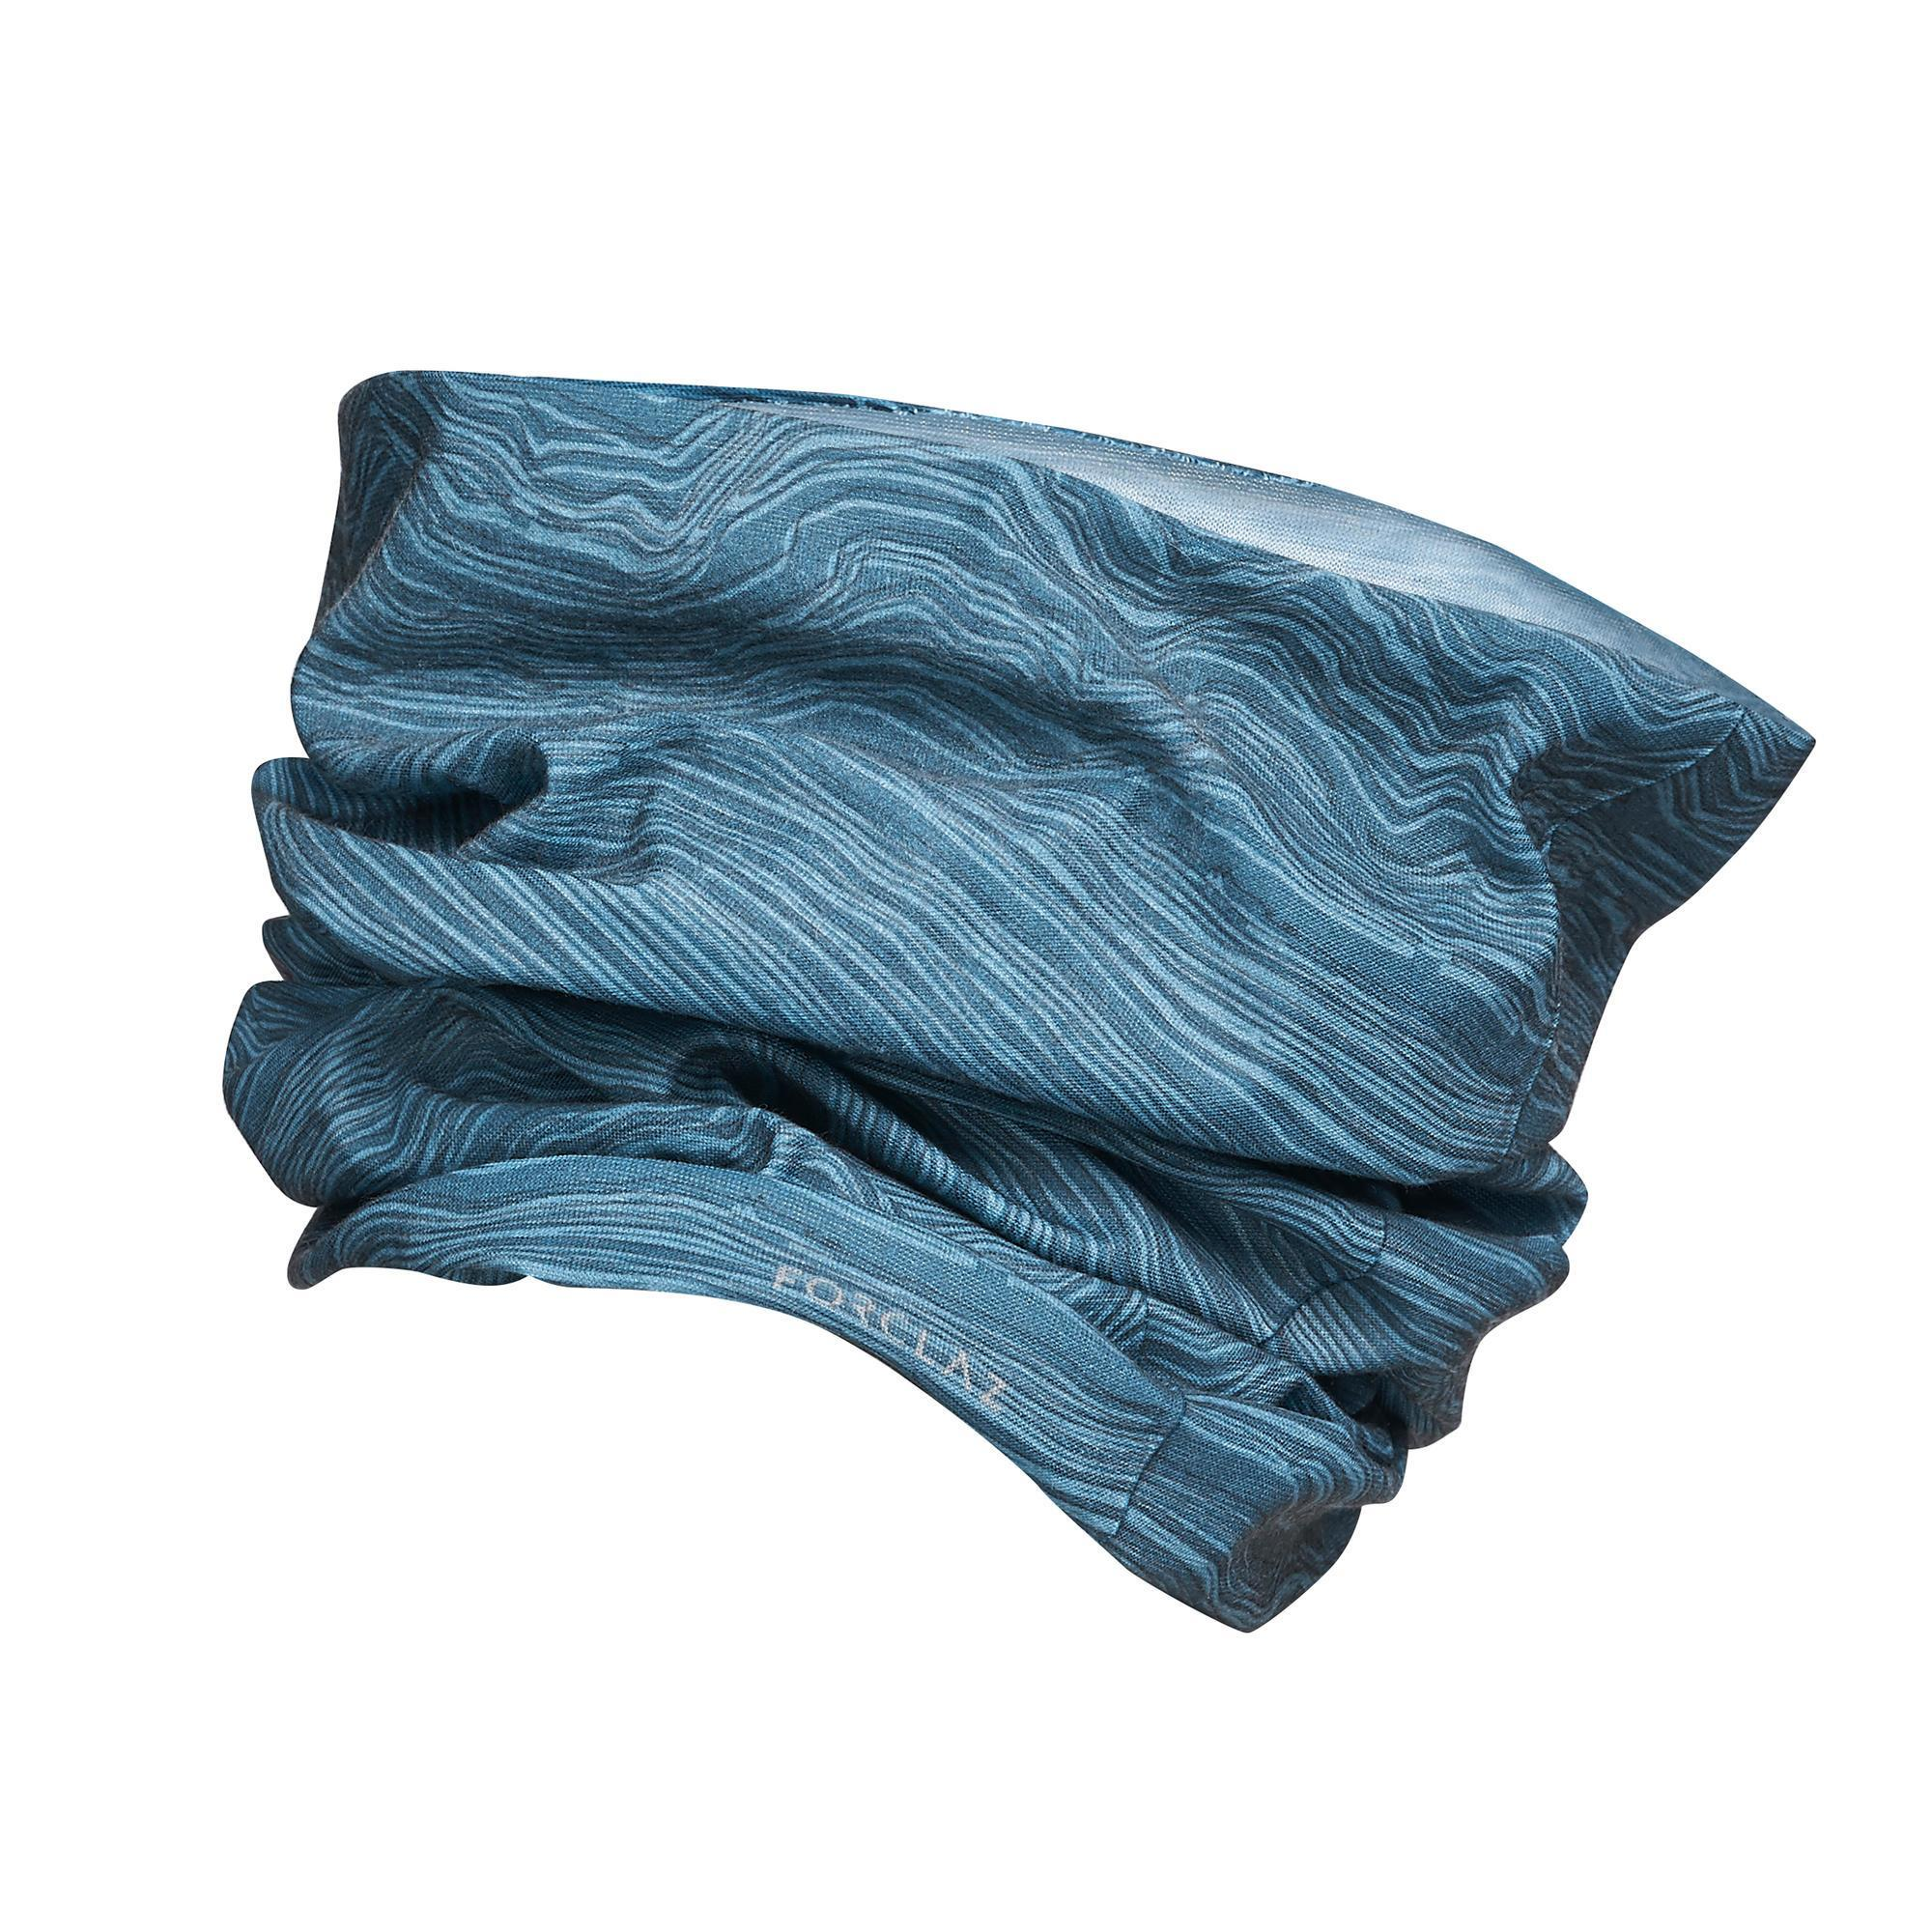 Multifunktionstuch Trek 100 blau | Accessoires > Schals & Tücher > Tücher | Blau | Jersey | Forclaz